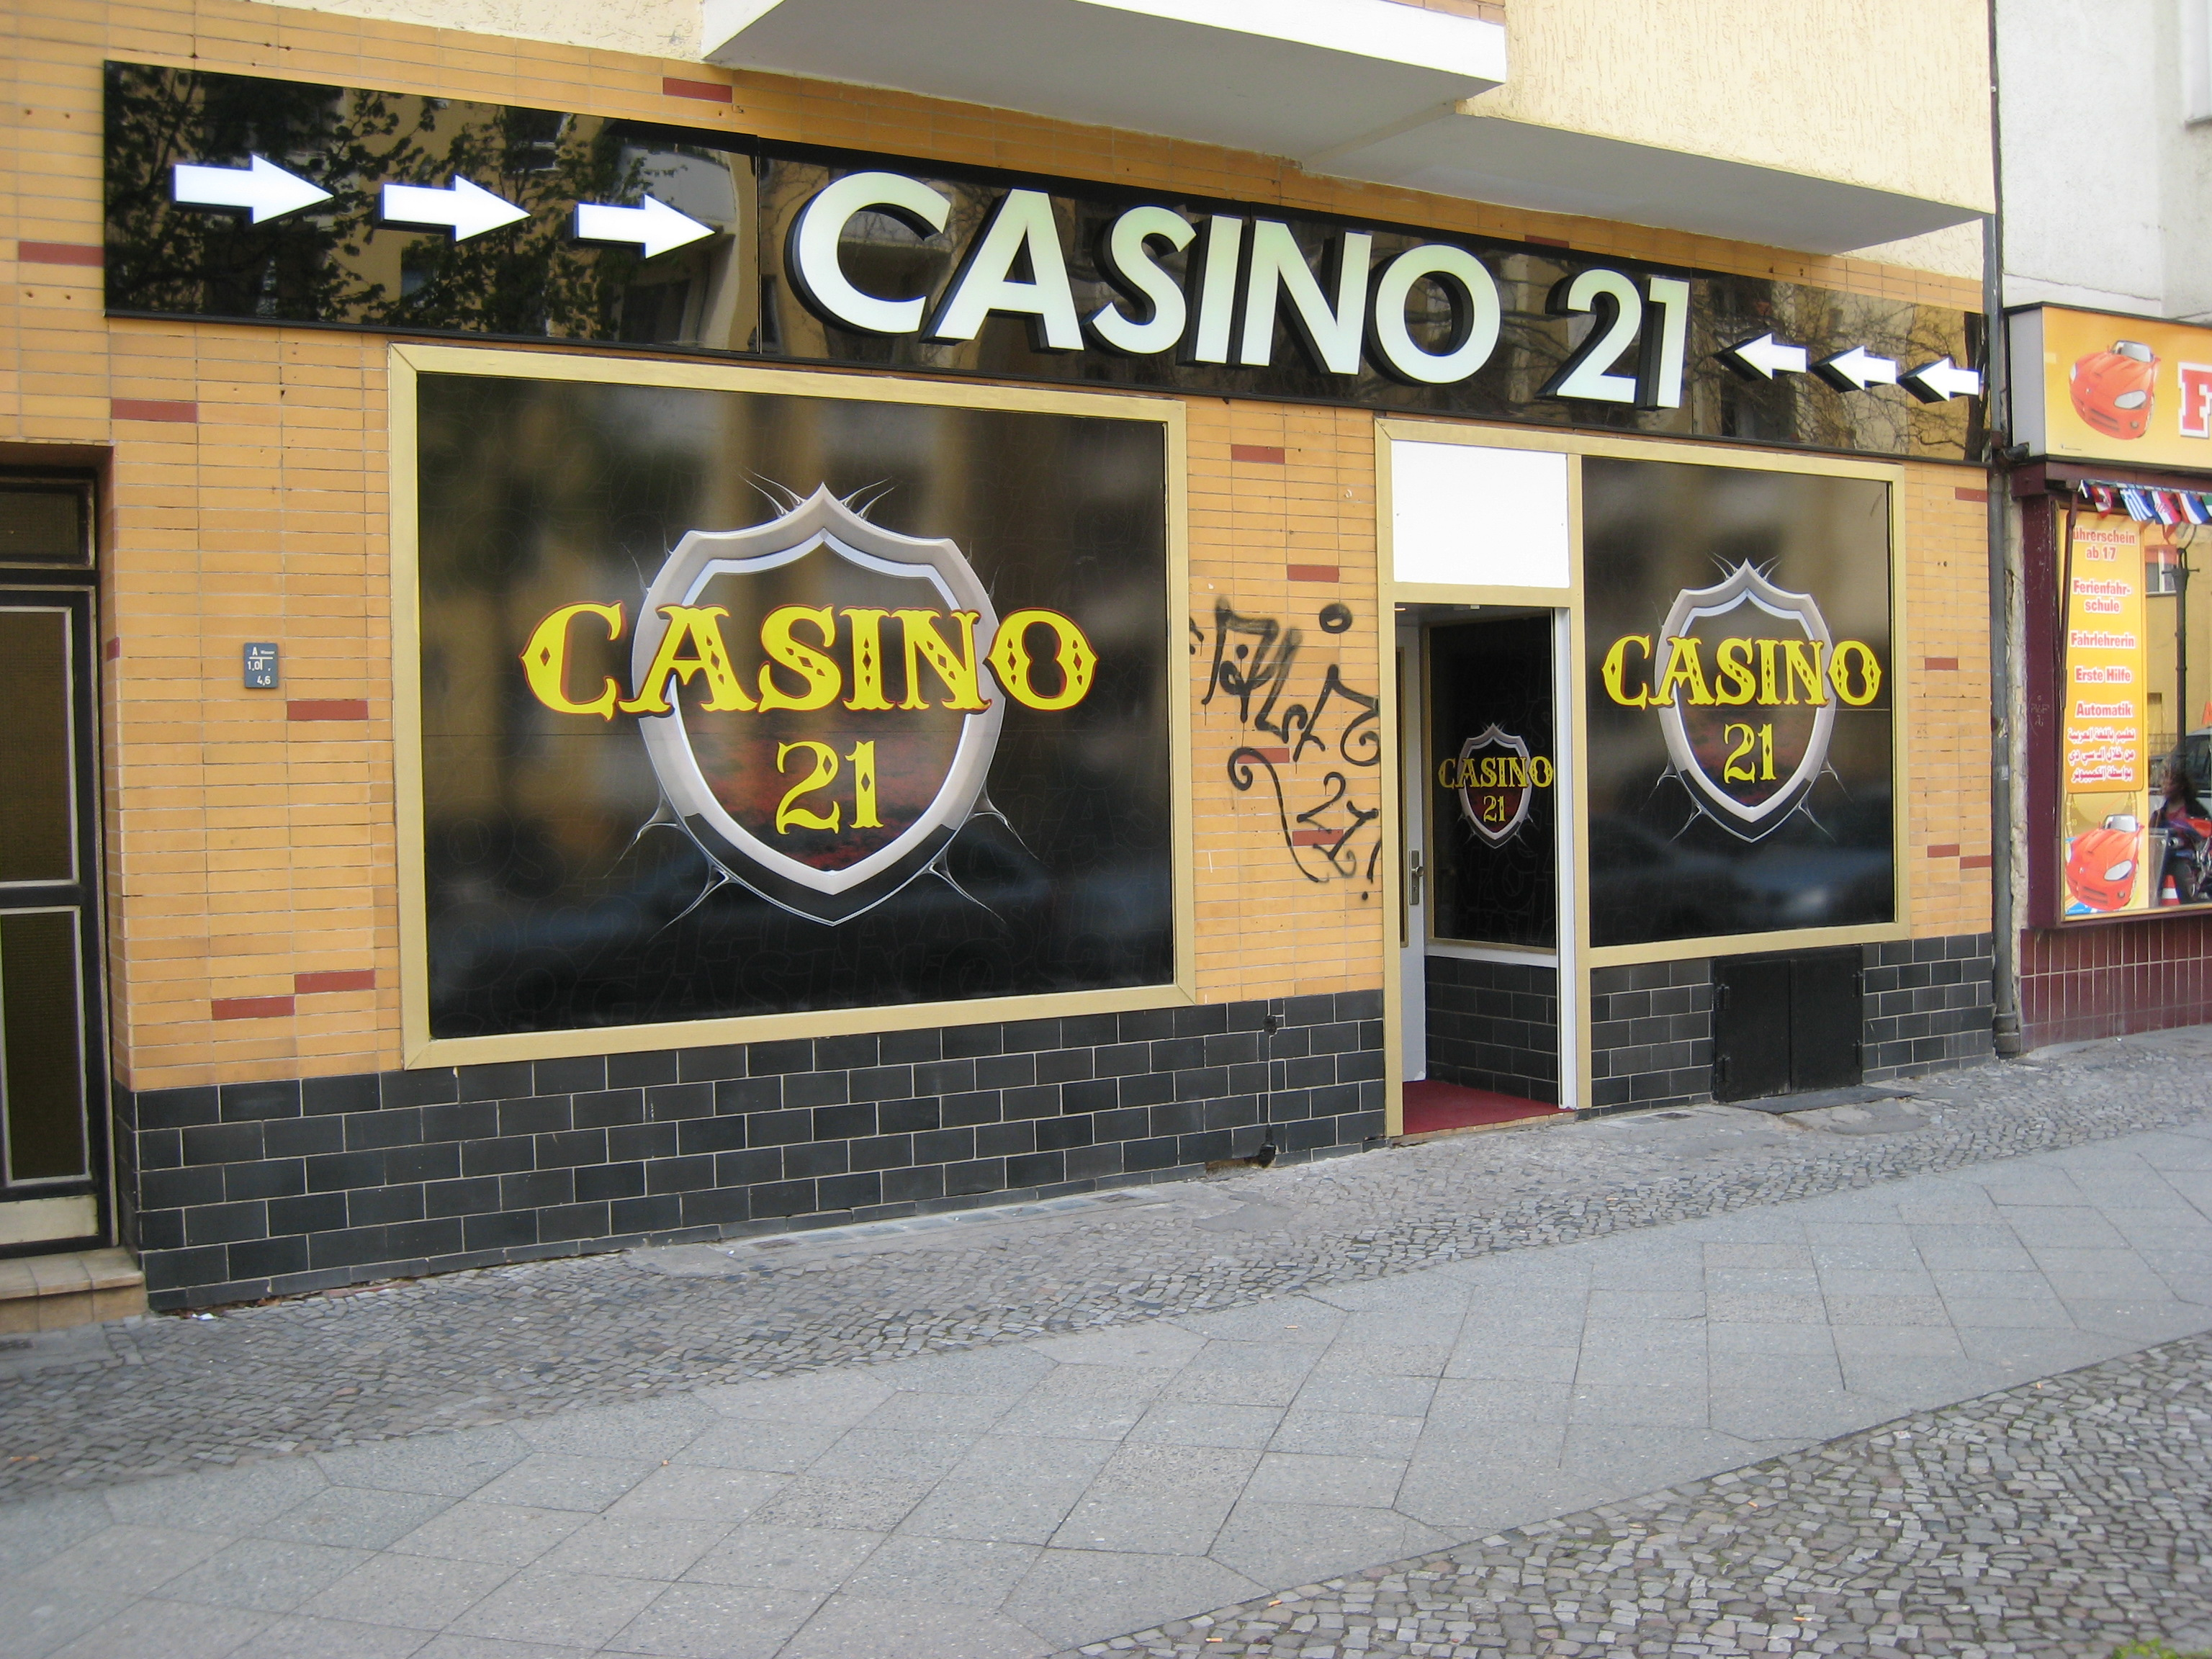 Casino 21 Berlin Potsdamer Str Startseite